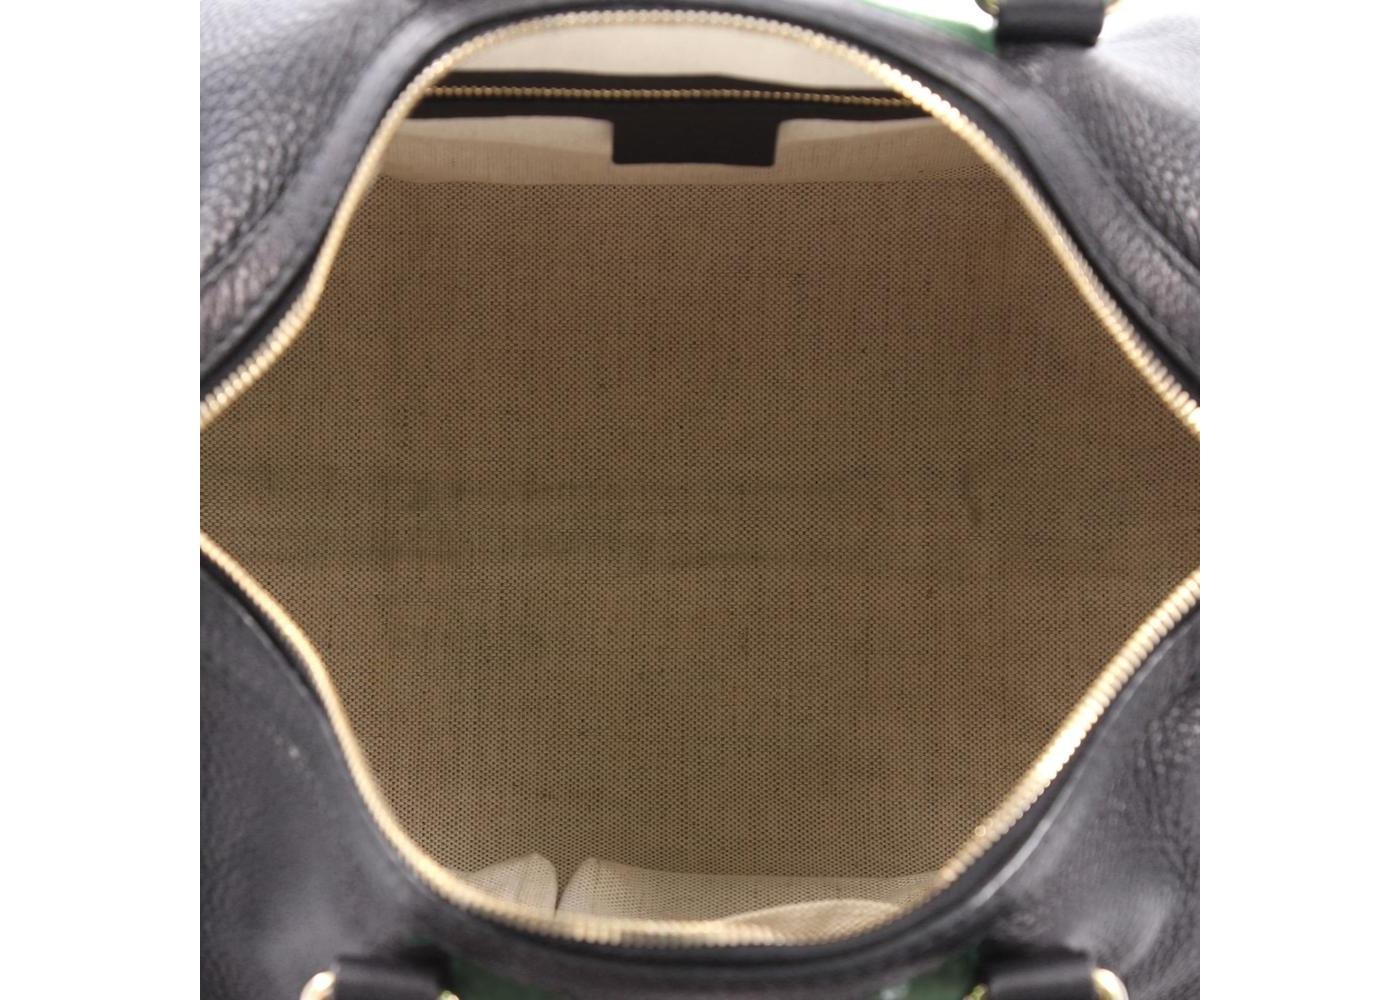 d85aaf22ea11 Buy & Sell Gucci Luxury Handbags